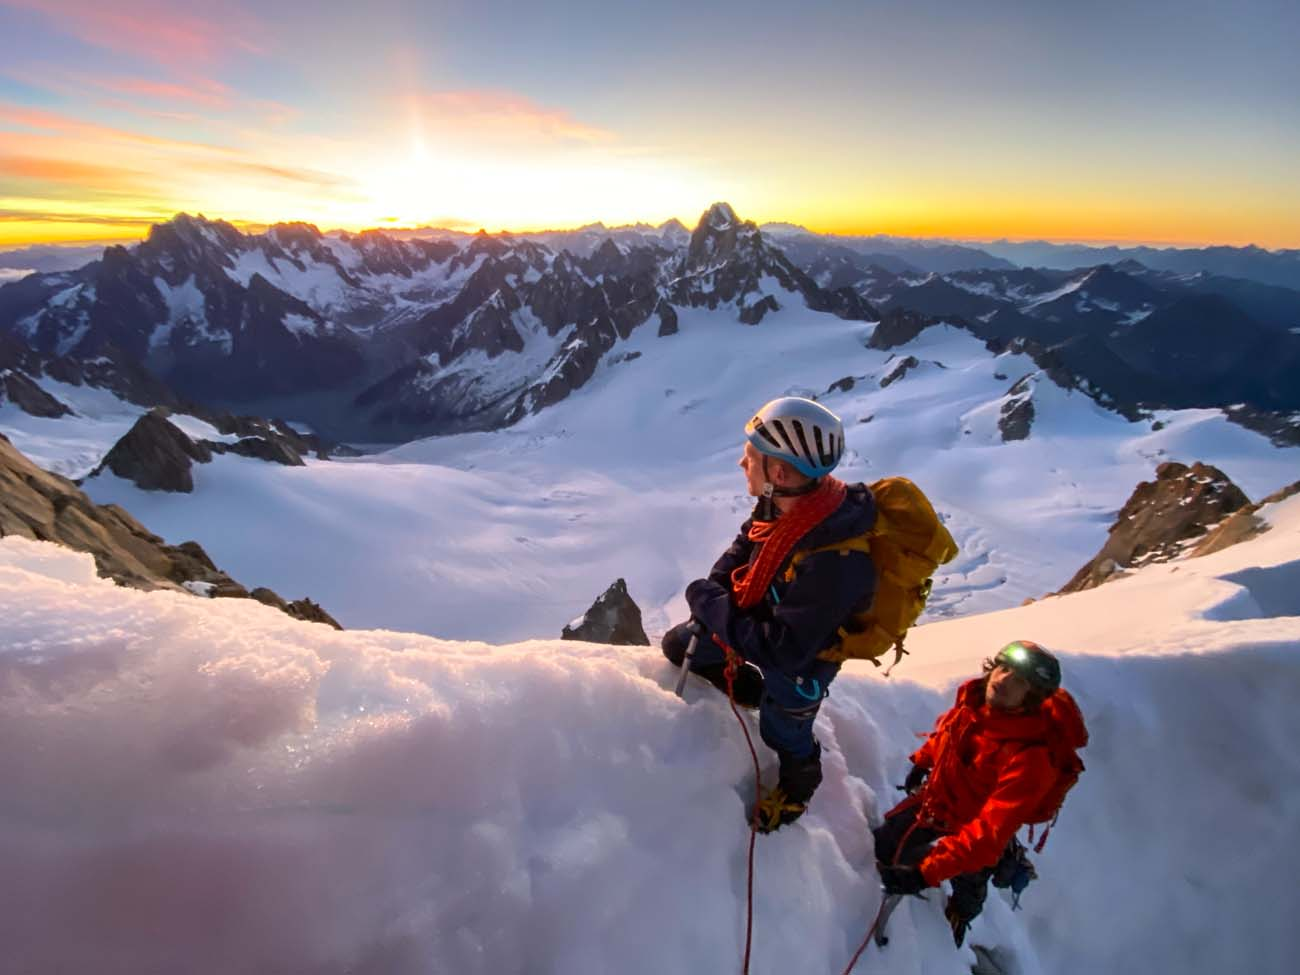 Prachtige zonsopgang tijdens beklimming